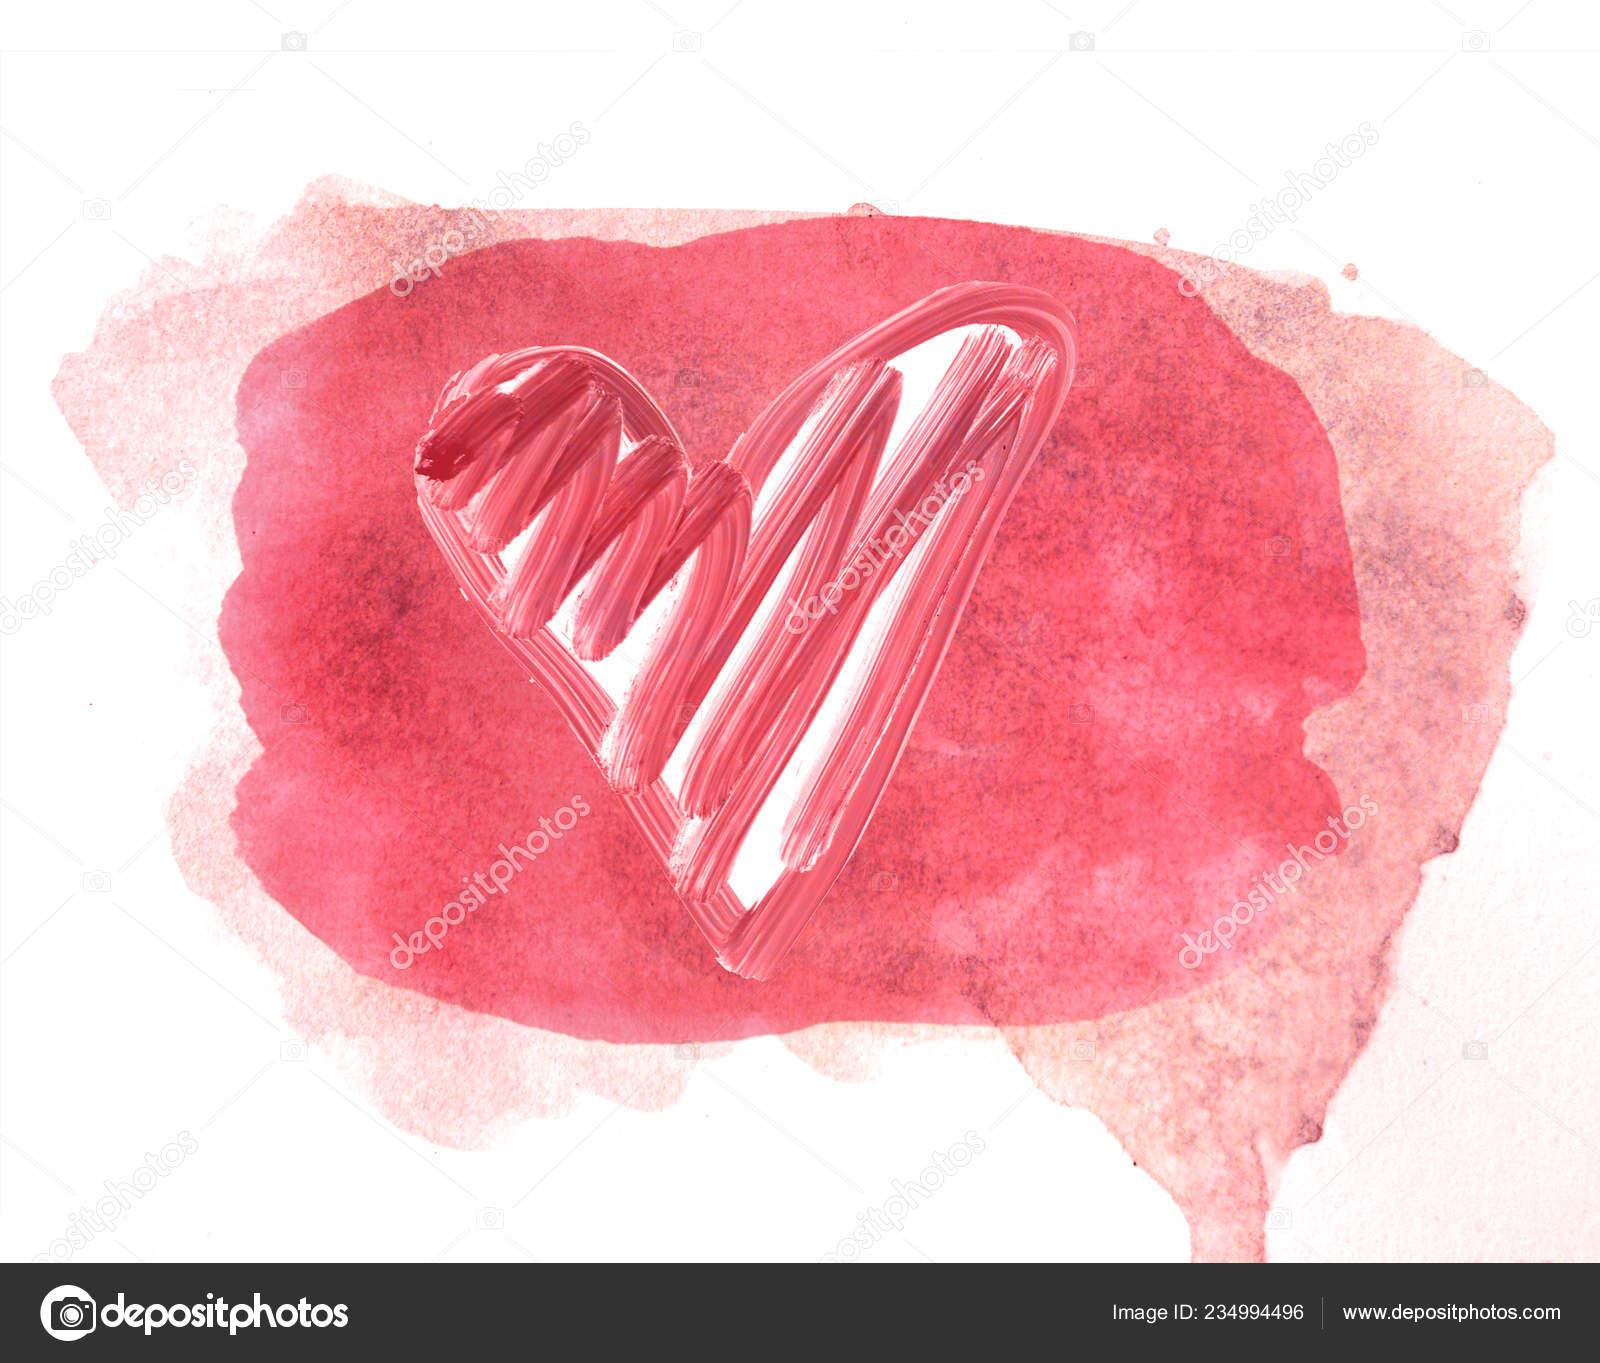 Pembe Sulu Boya Boyali Kalp Sekli Pembe Bir Arka Plan Stok Foto